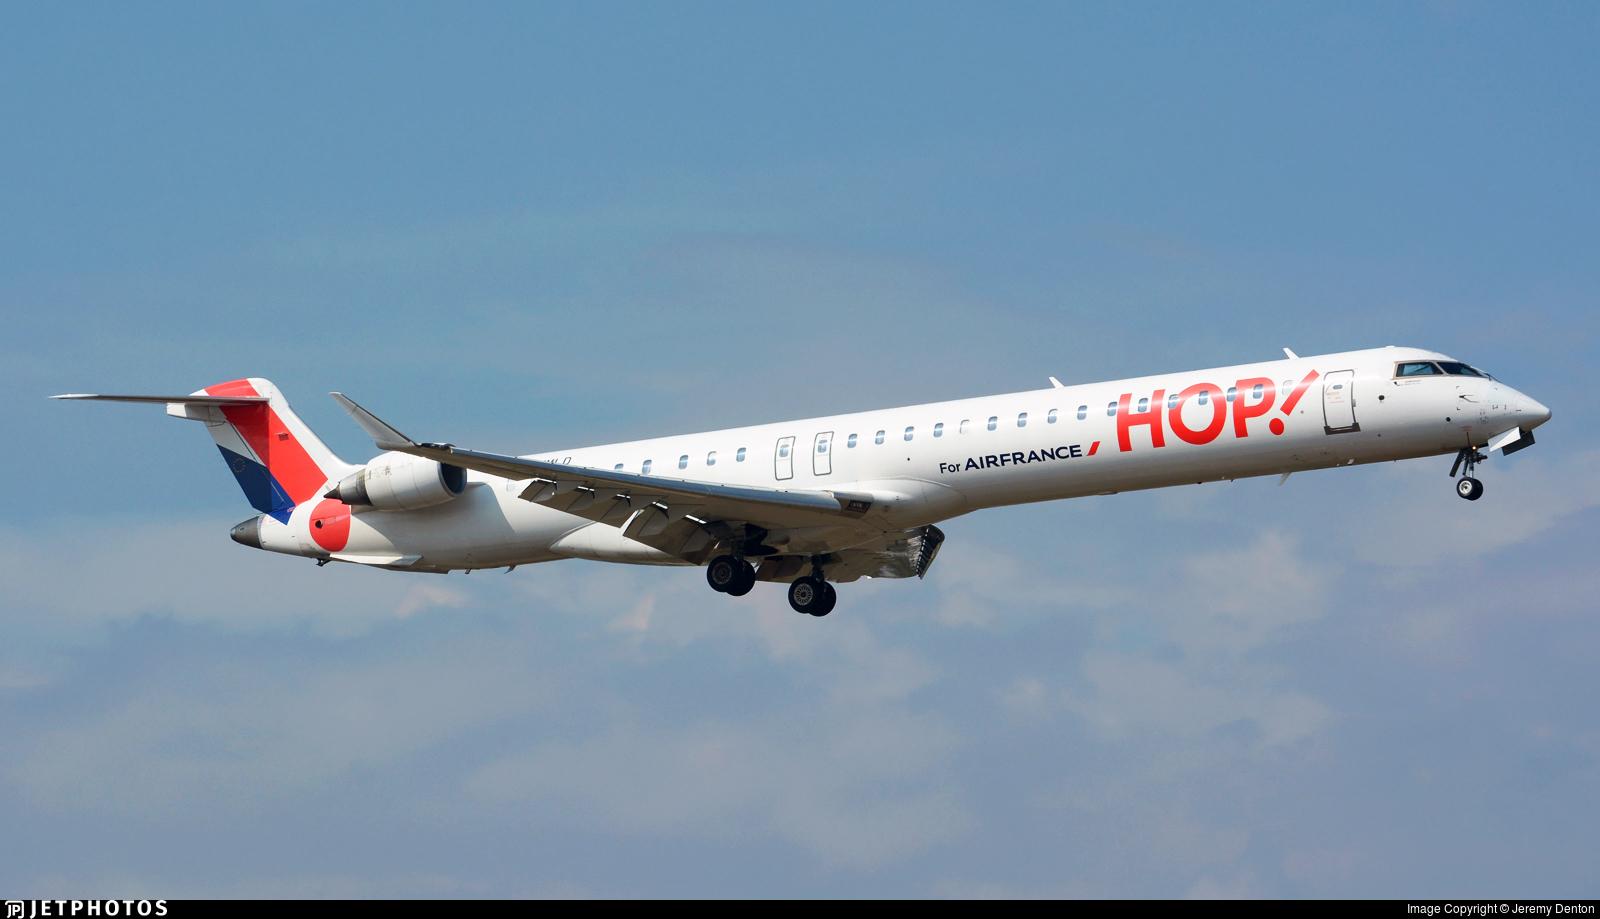 F-HMLD - Bombardier CRJ-1000EL - HOP! for Air France